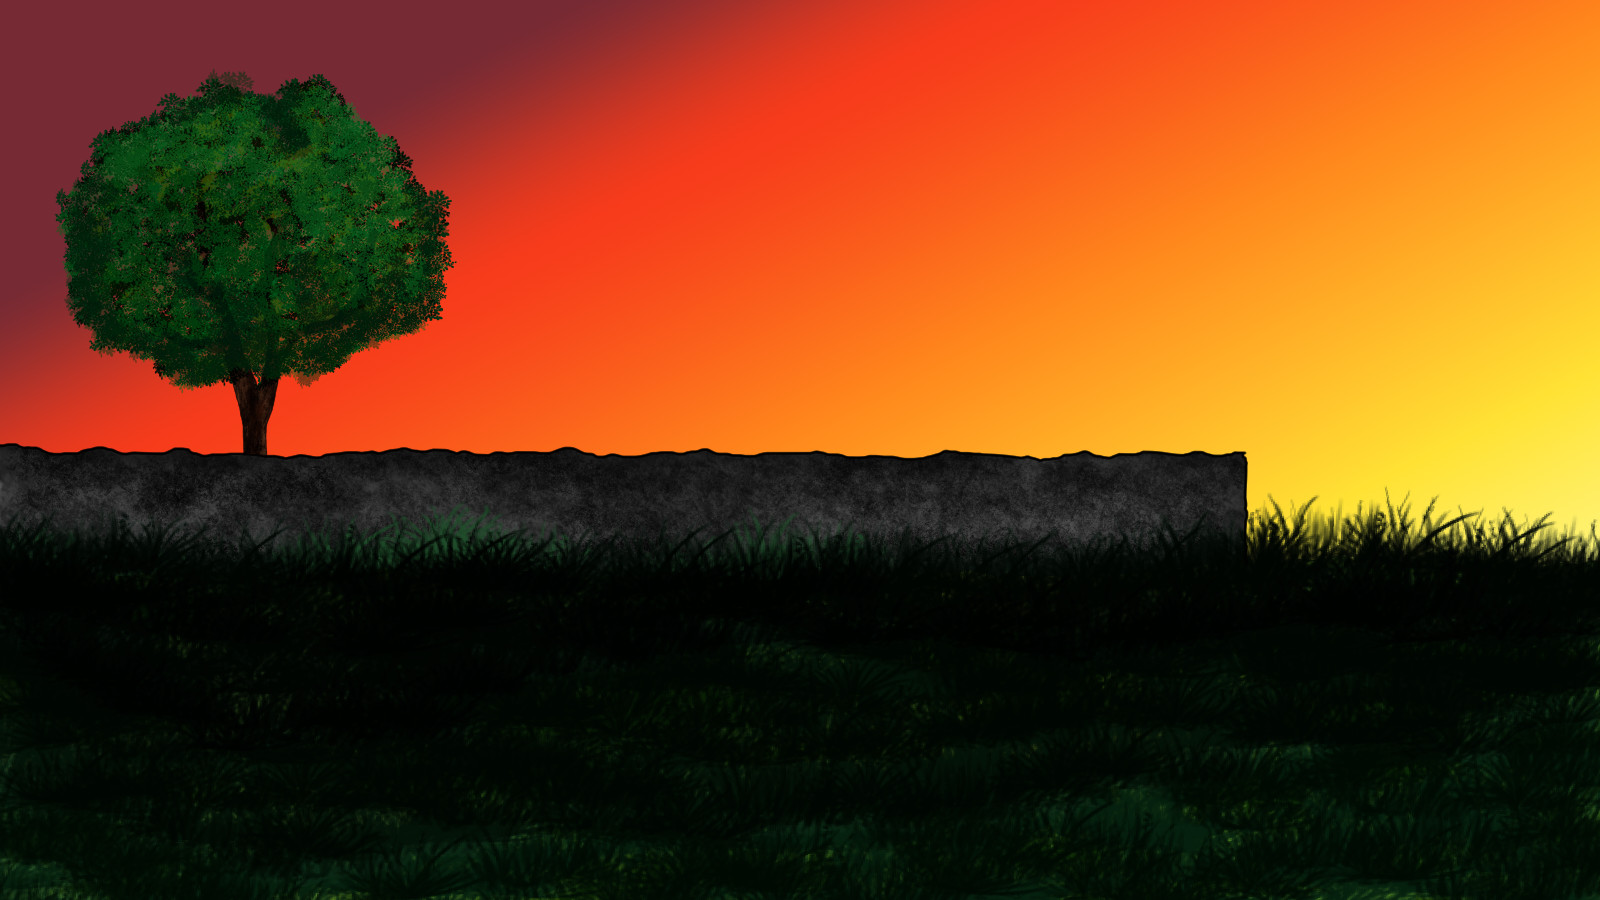 Background 2